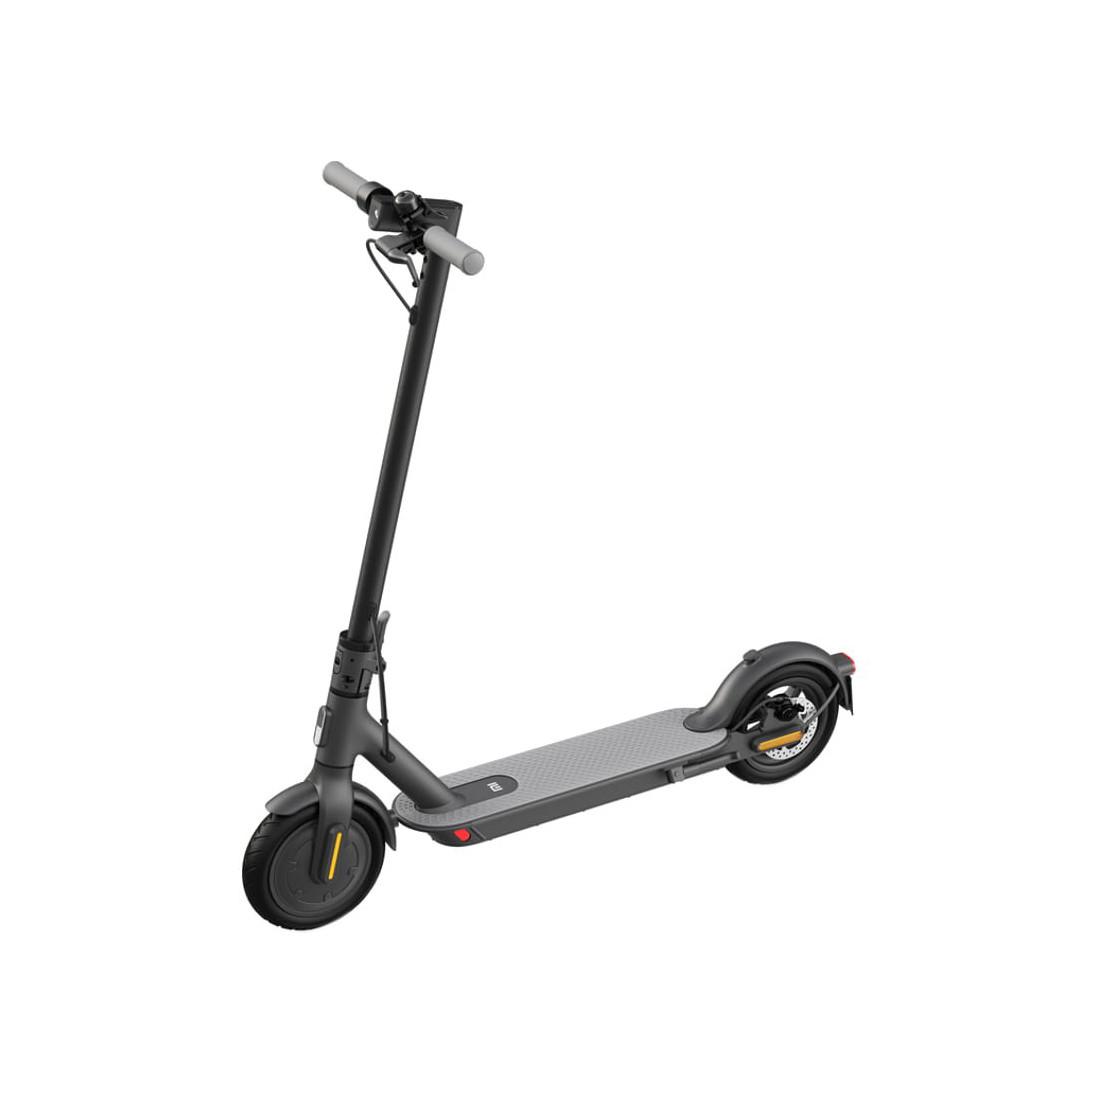 Электросамокат, Xiaomi, MiJia Smart Electric Scooter Essential FBC4022GL, Черный - фото 1